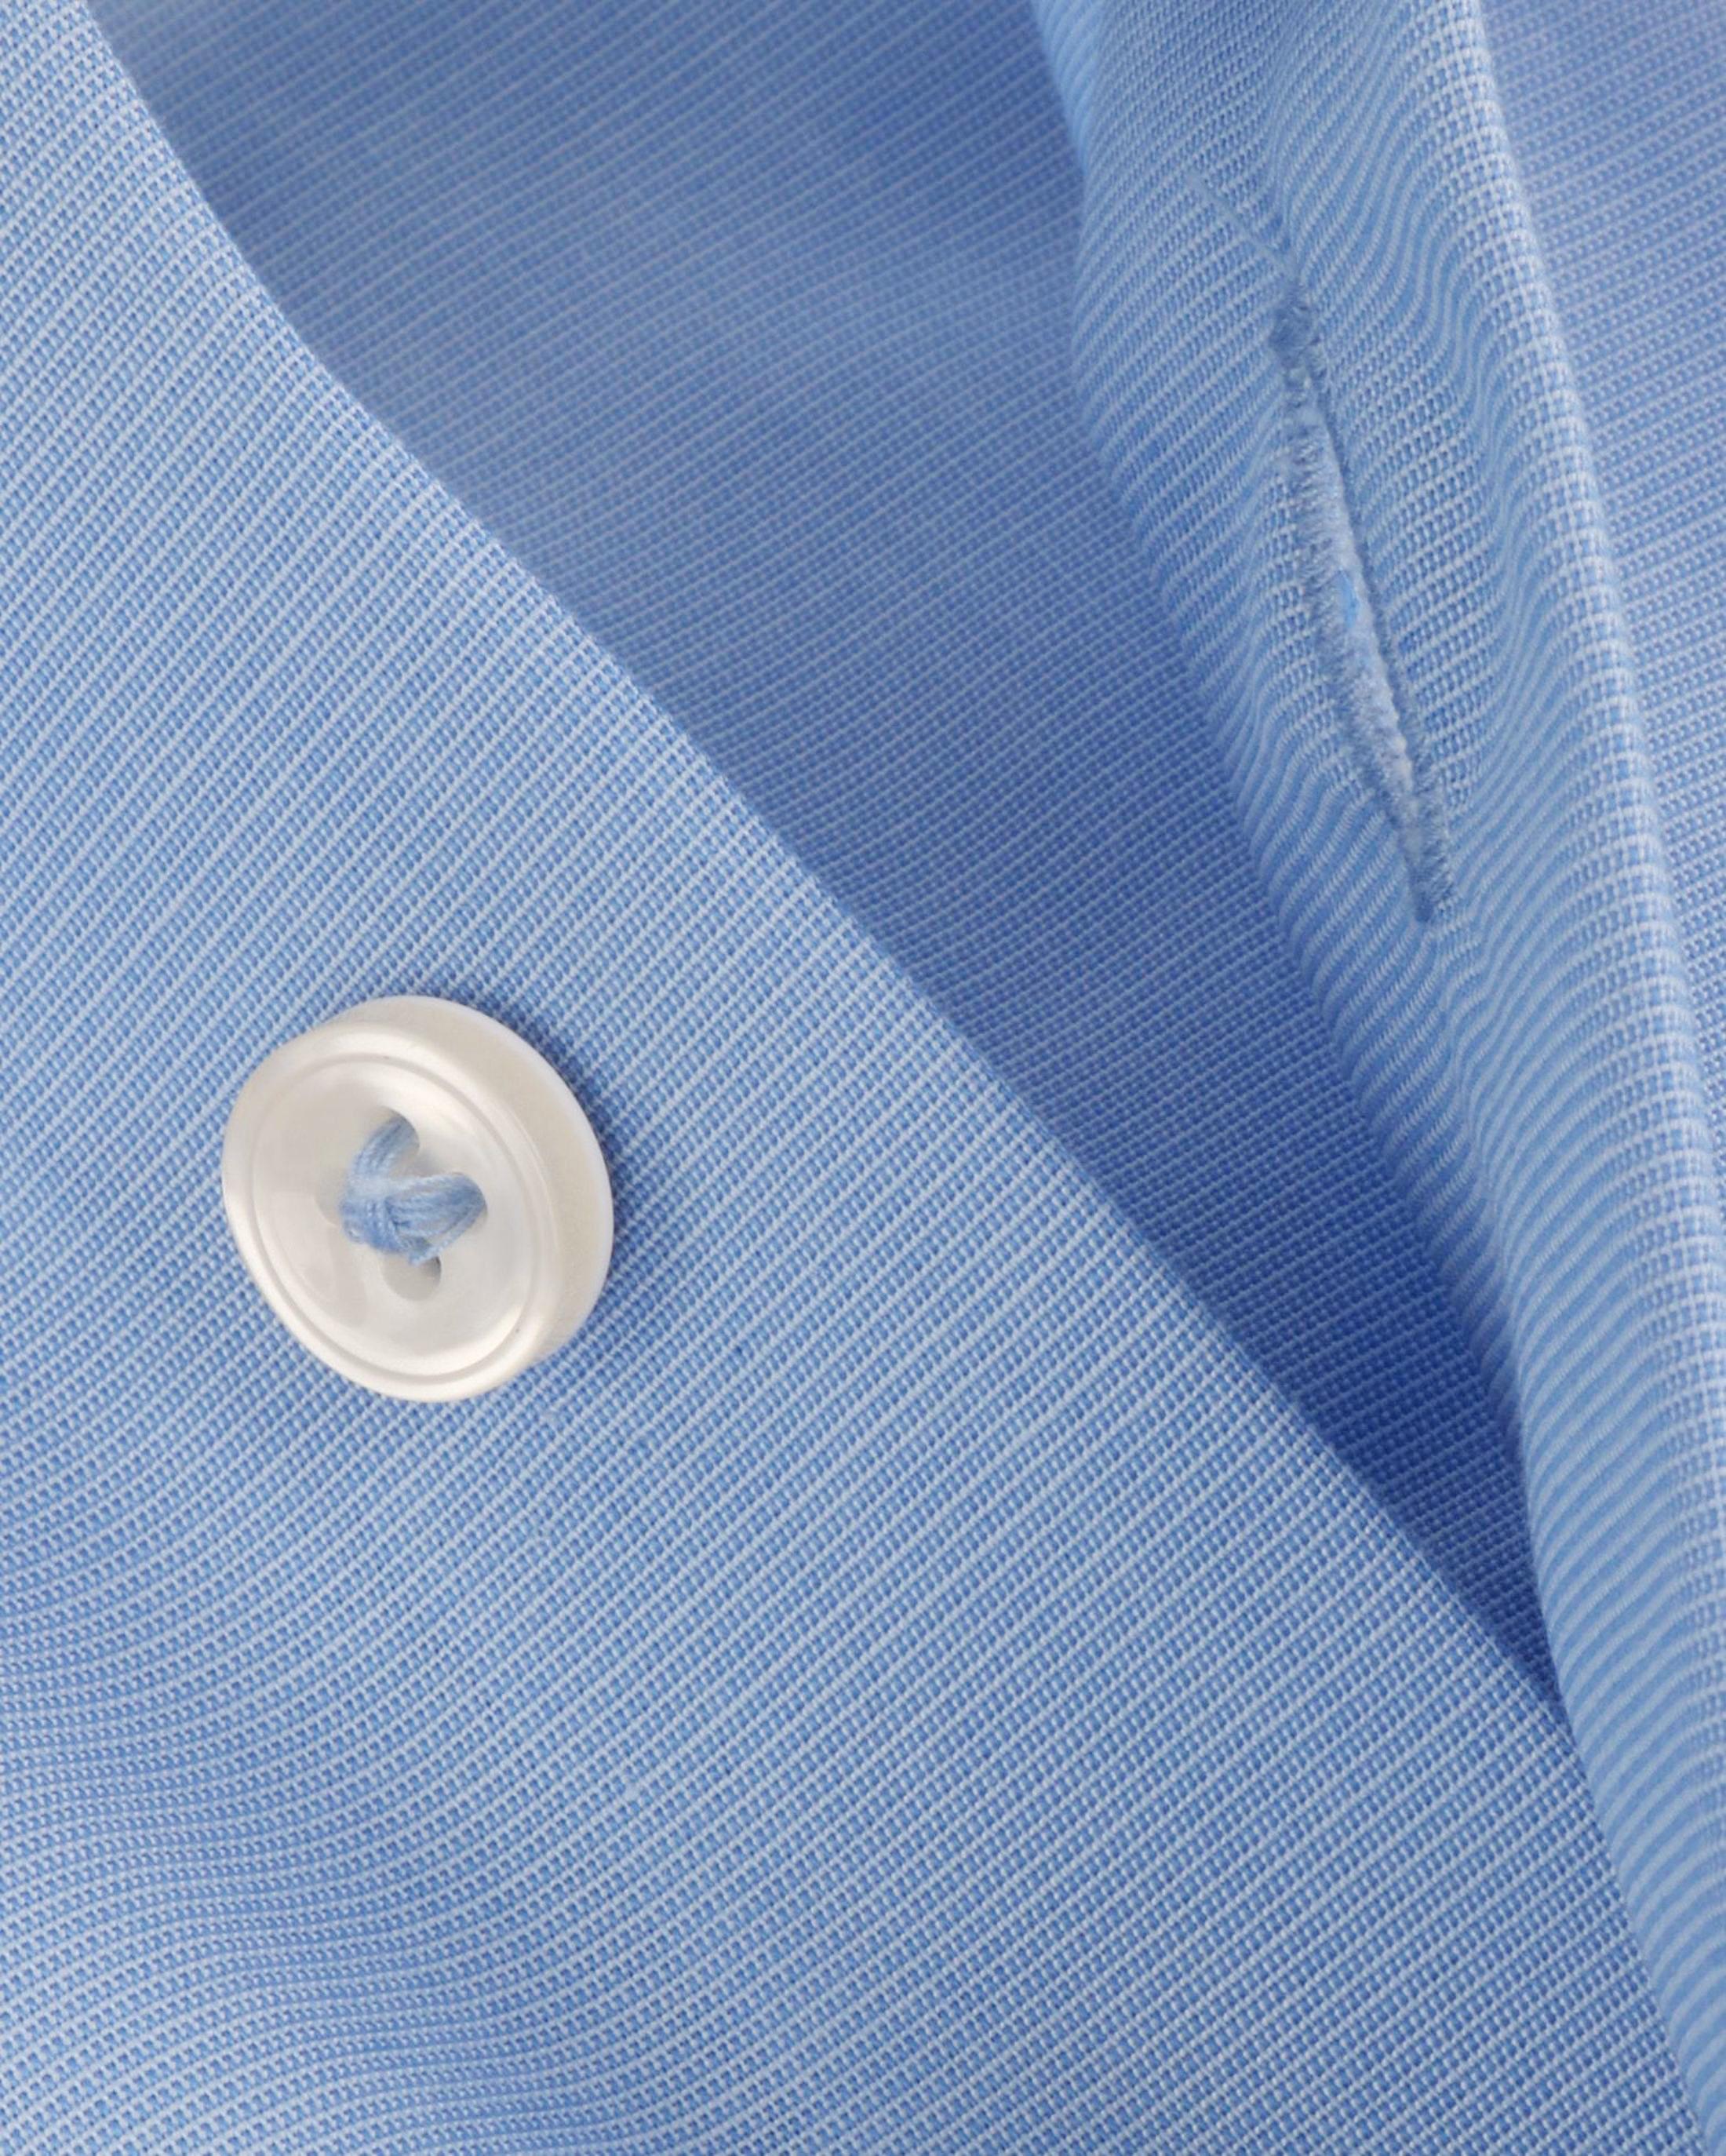 Seidensticker Splendesto Overhemd Blauw foto 1